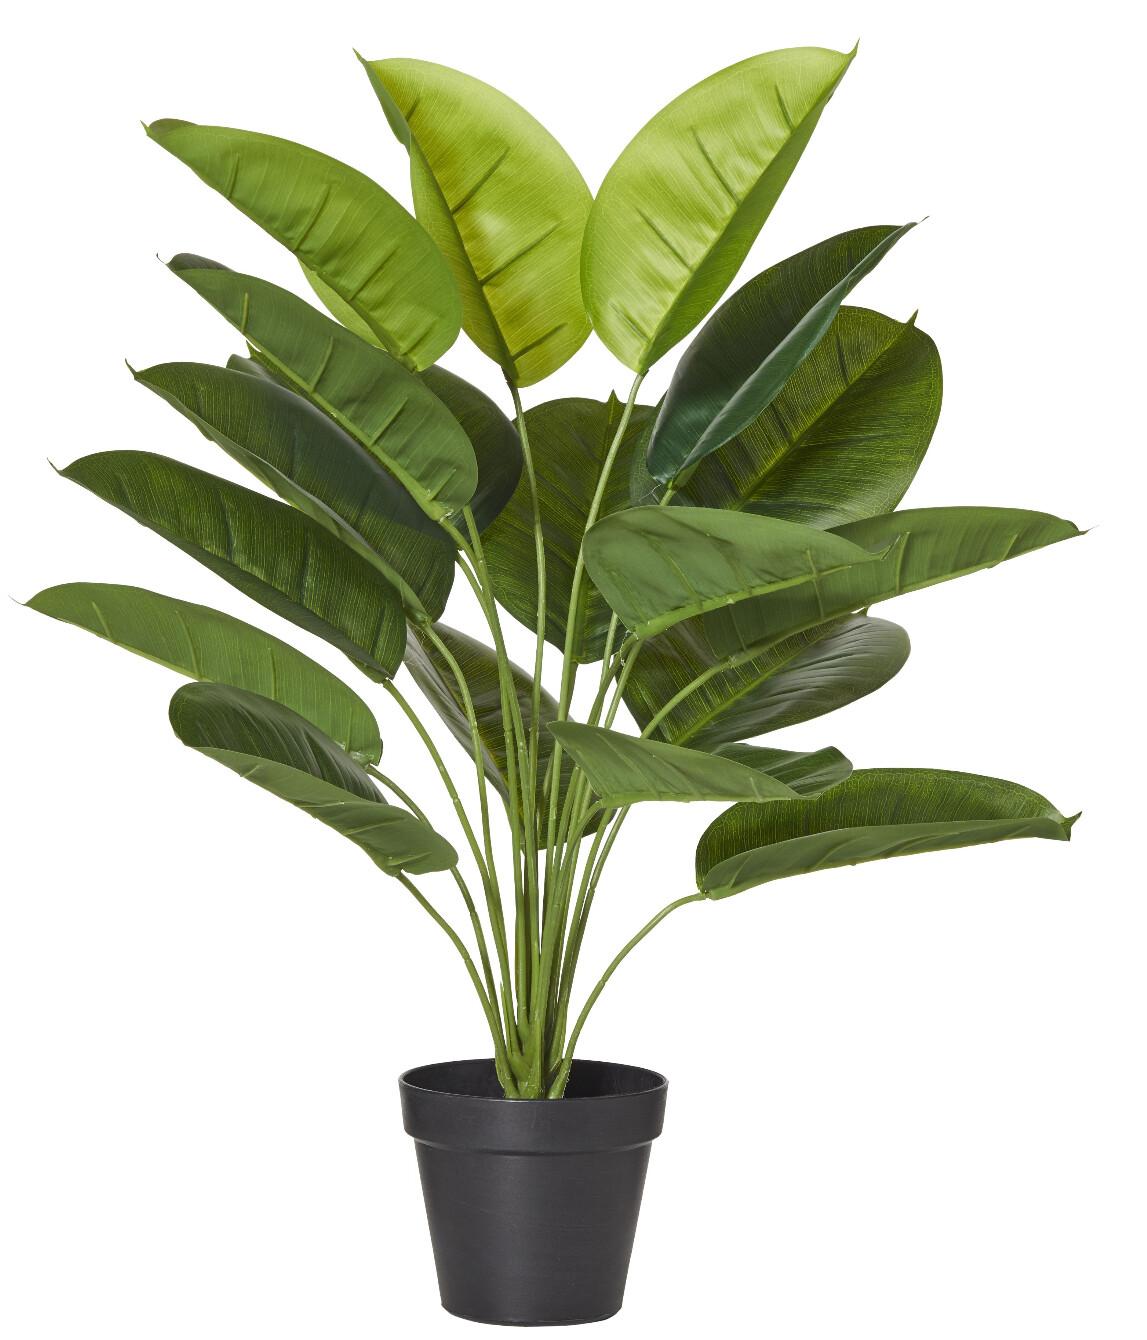 SMALL EVERGREEN PLANT GARDEN POT